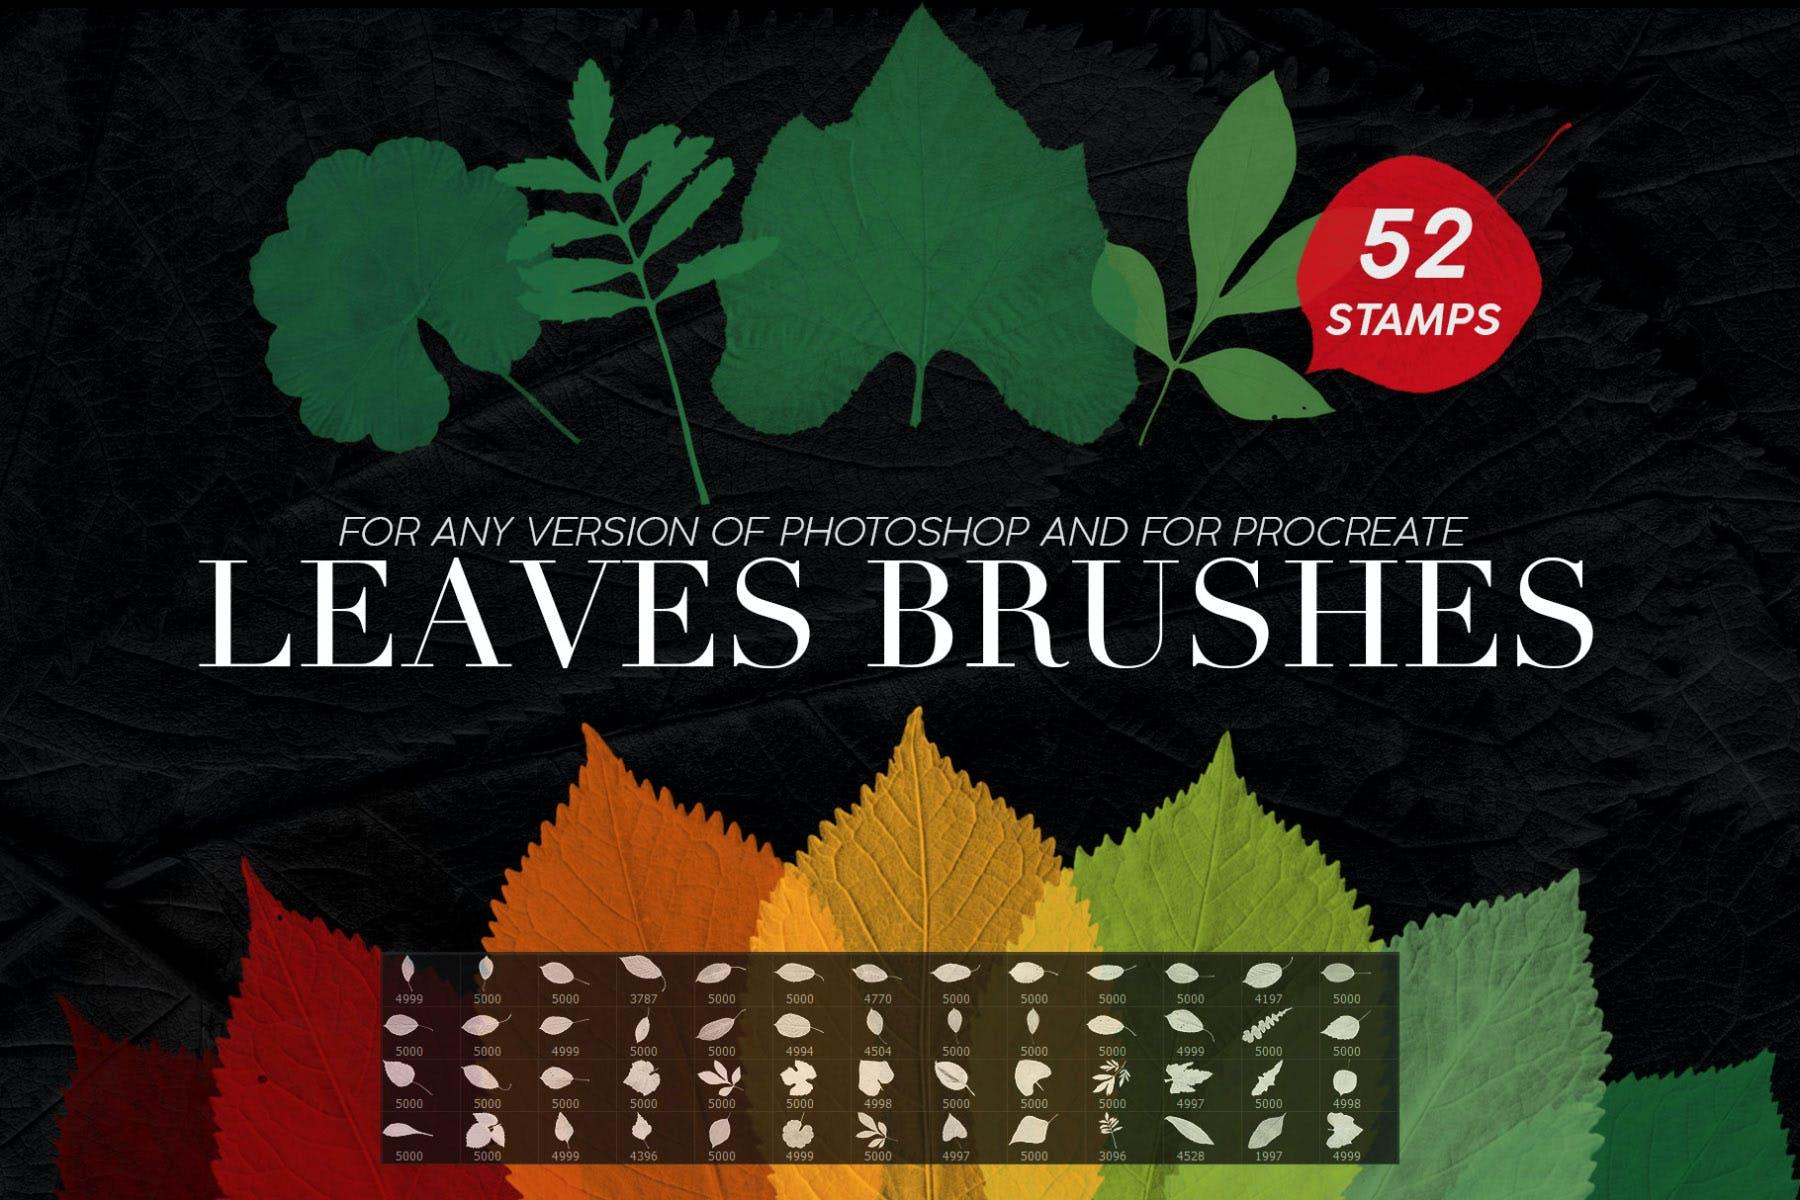 PS印章树叶图形笔刷合集 52 Leaves Photoshop Stamp Brushes设计素材模板